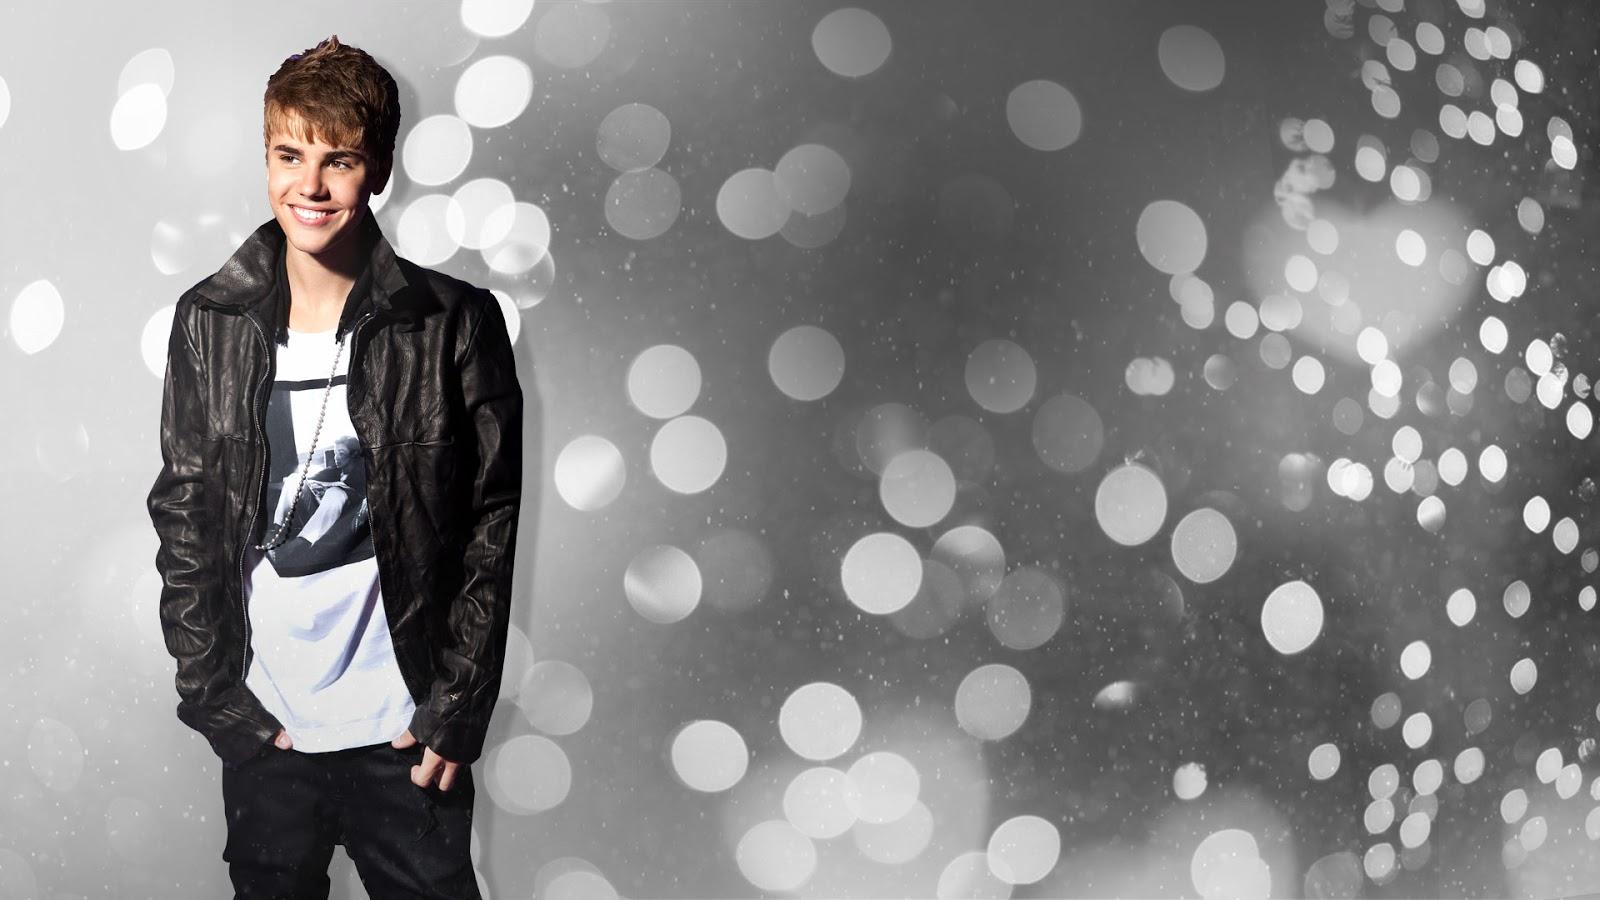 Hd wallpaper justin bieber -  Wallpaper Hot Photos Full Hd Justin Bieber Hd Photos Justin Bieber Hd Image Justin Bieber Hd Picture Hot Celebrities Justin Bieber Hd Wallpaper